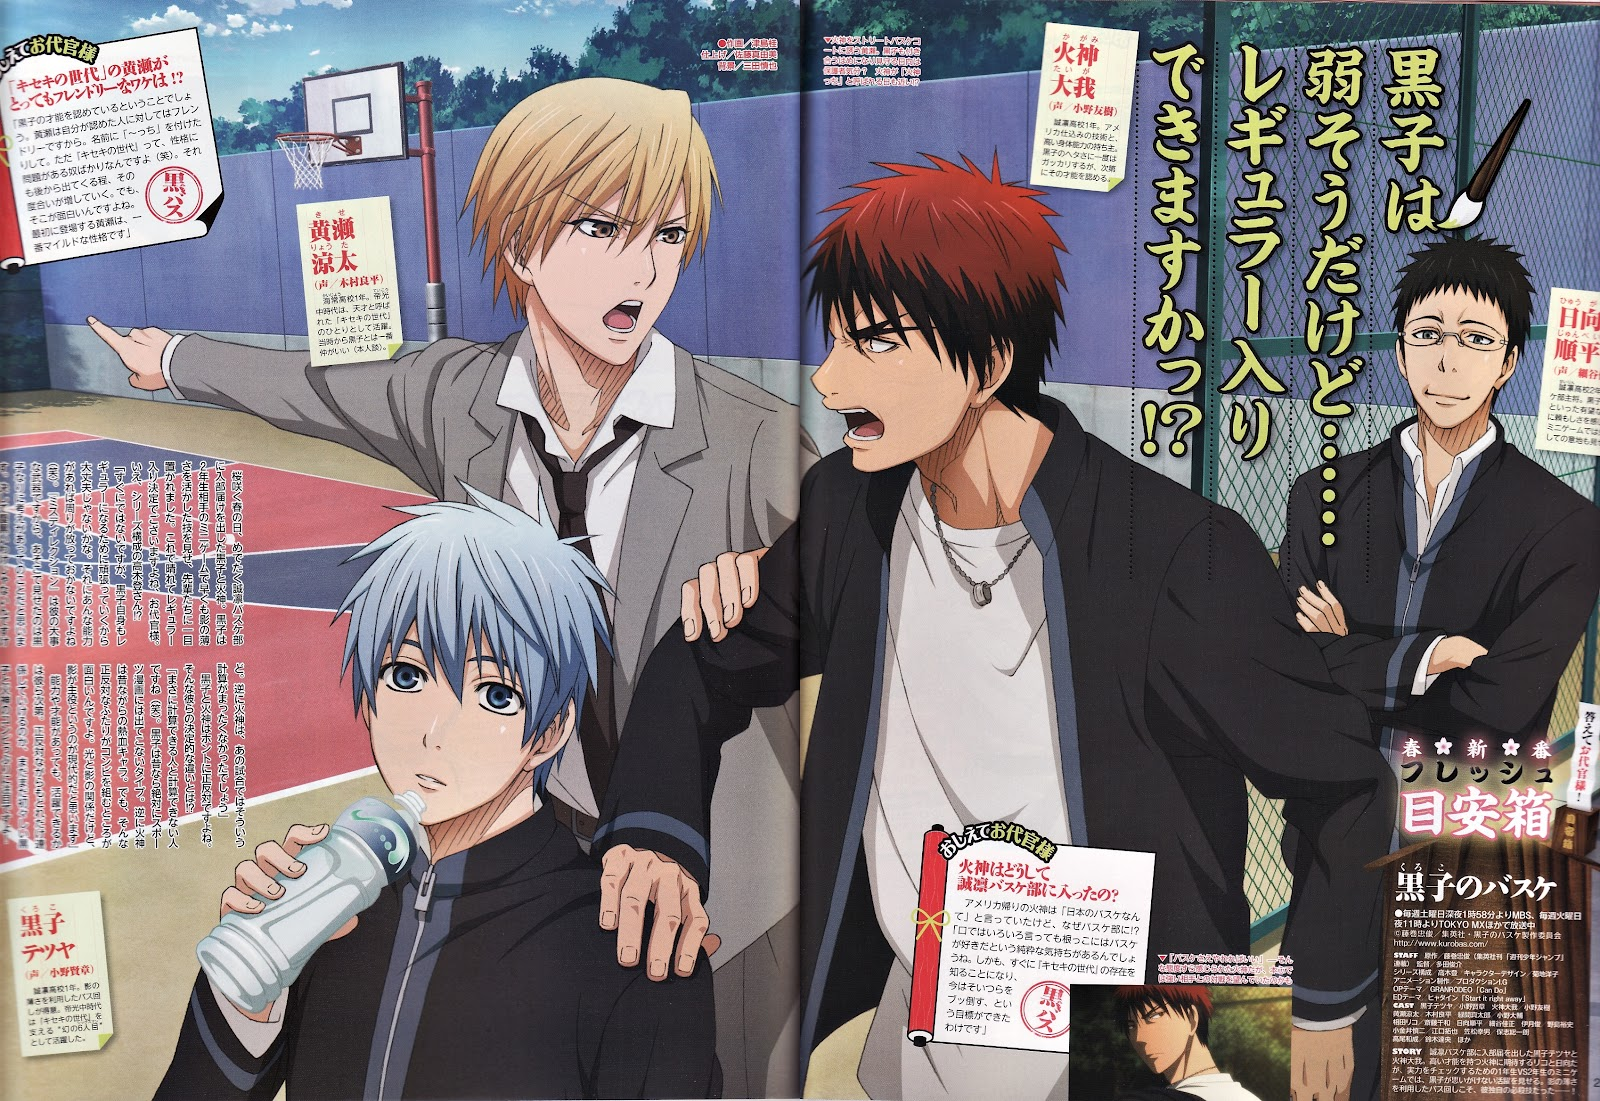 Top 20 Anime You Should Watch on Your Last Day Alive Kuroko no Basket